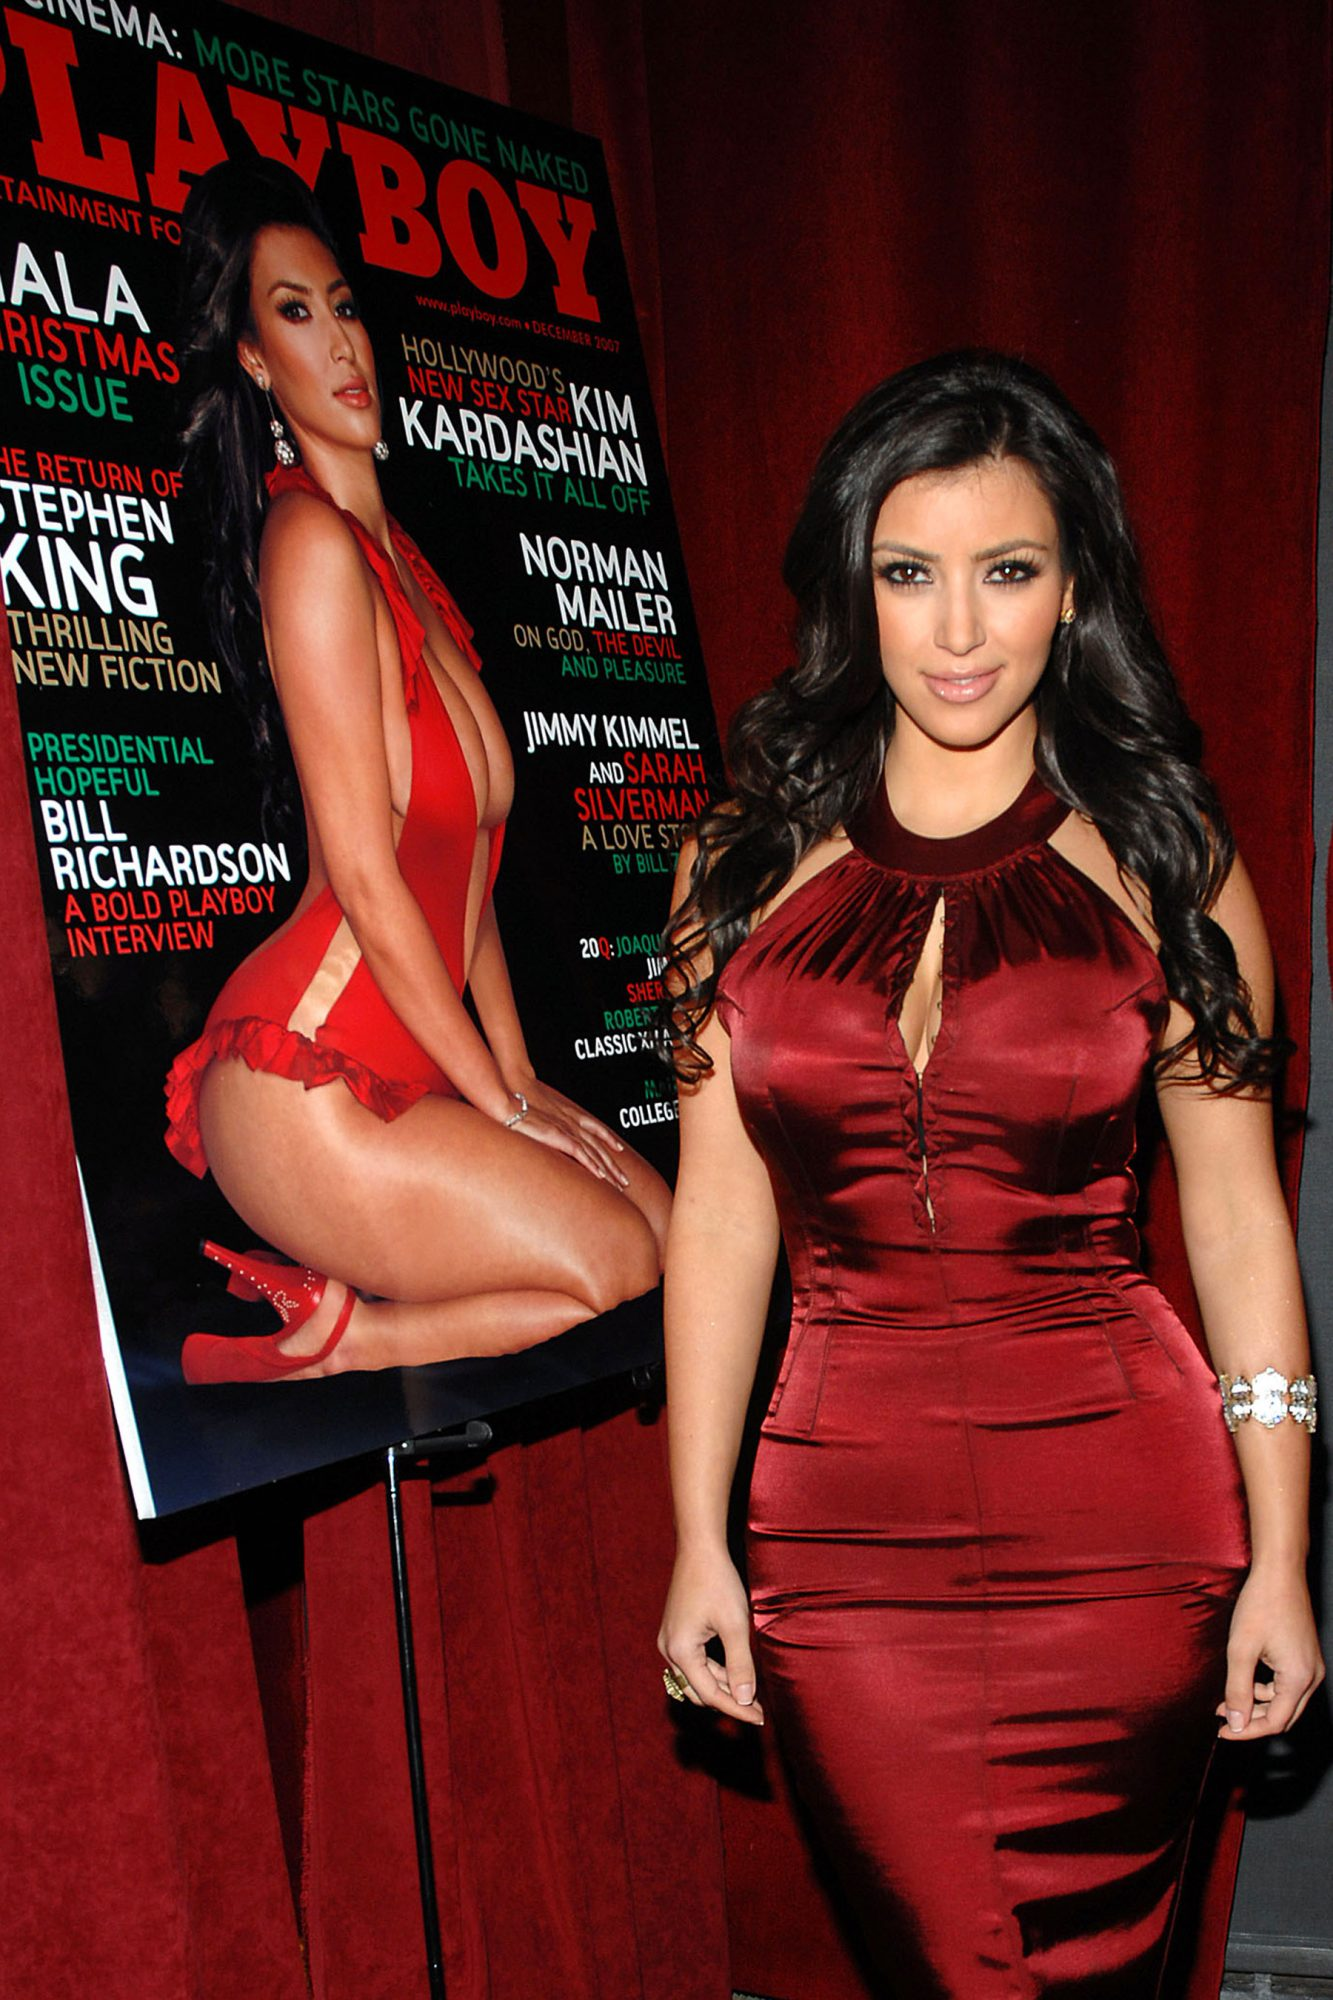 Playboy Celebrates December Cover Girl Kim Kardashian